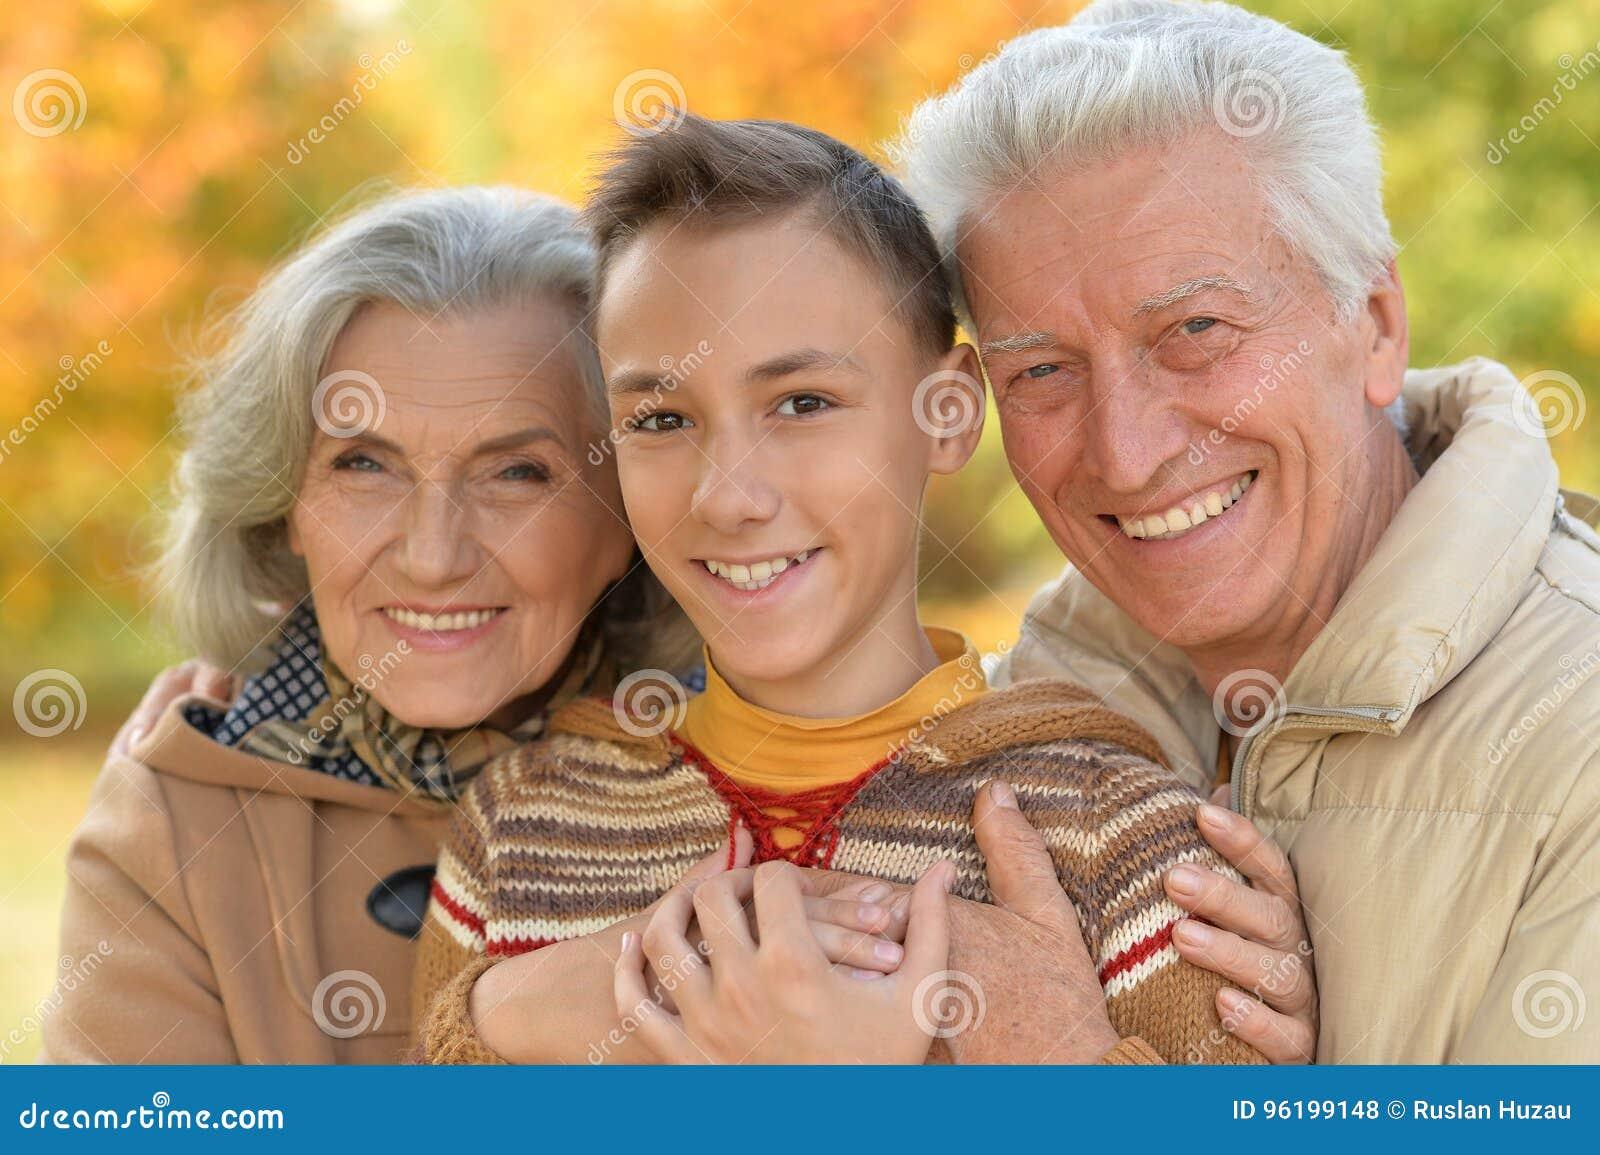 Цулуют бабушка и дедушка